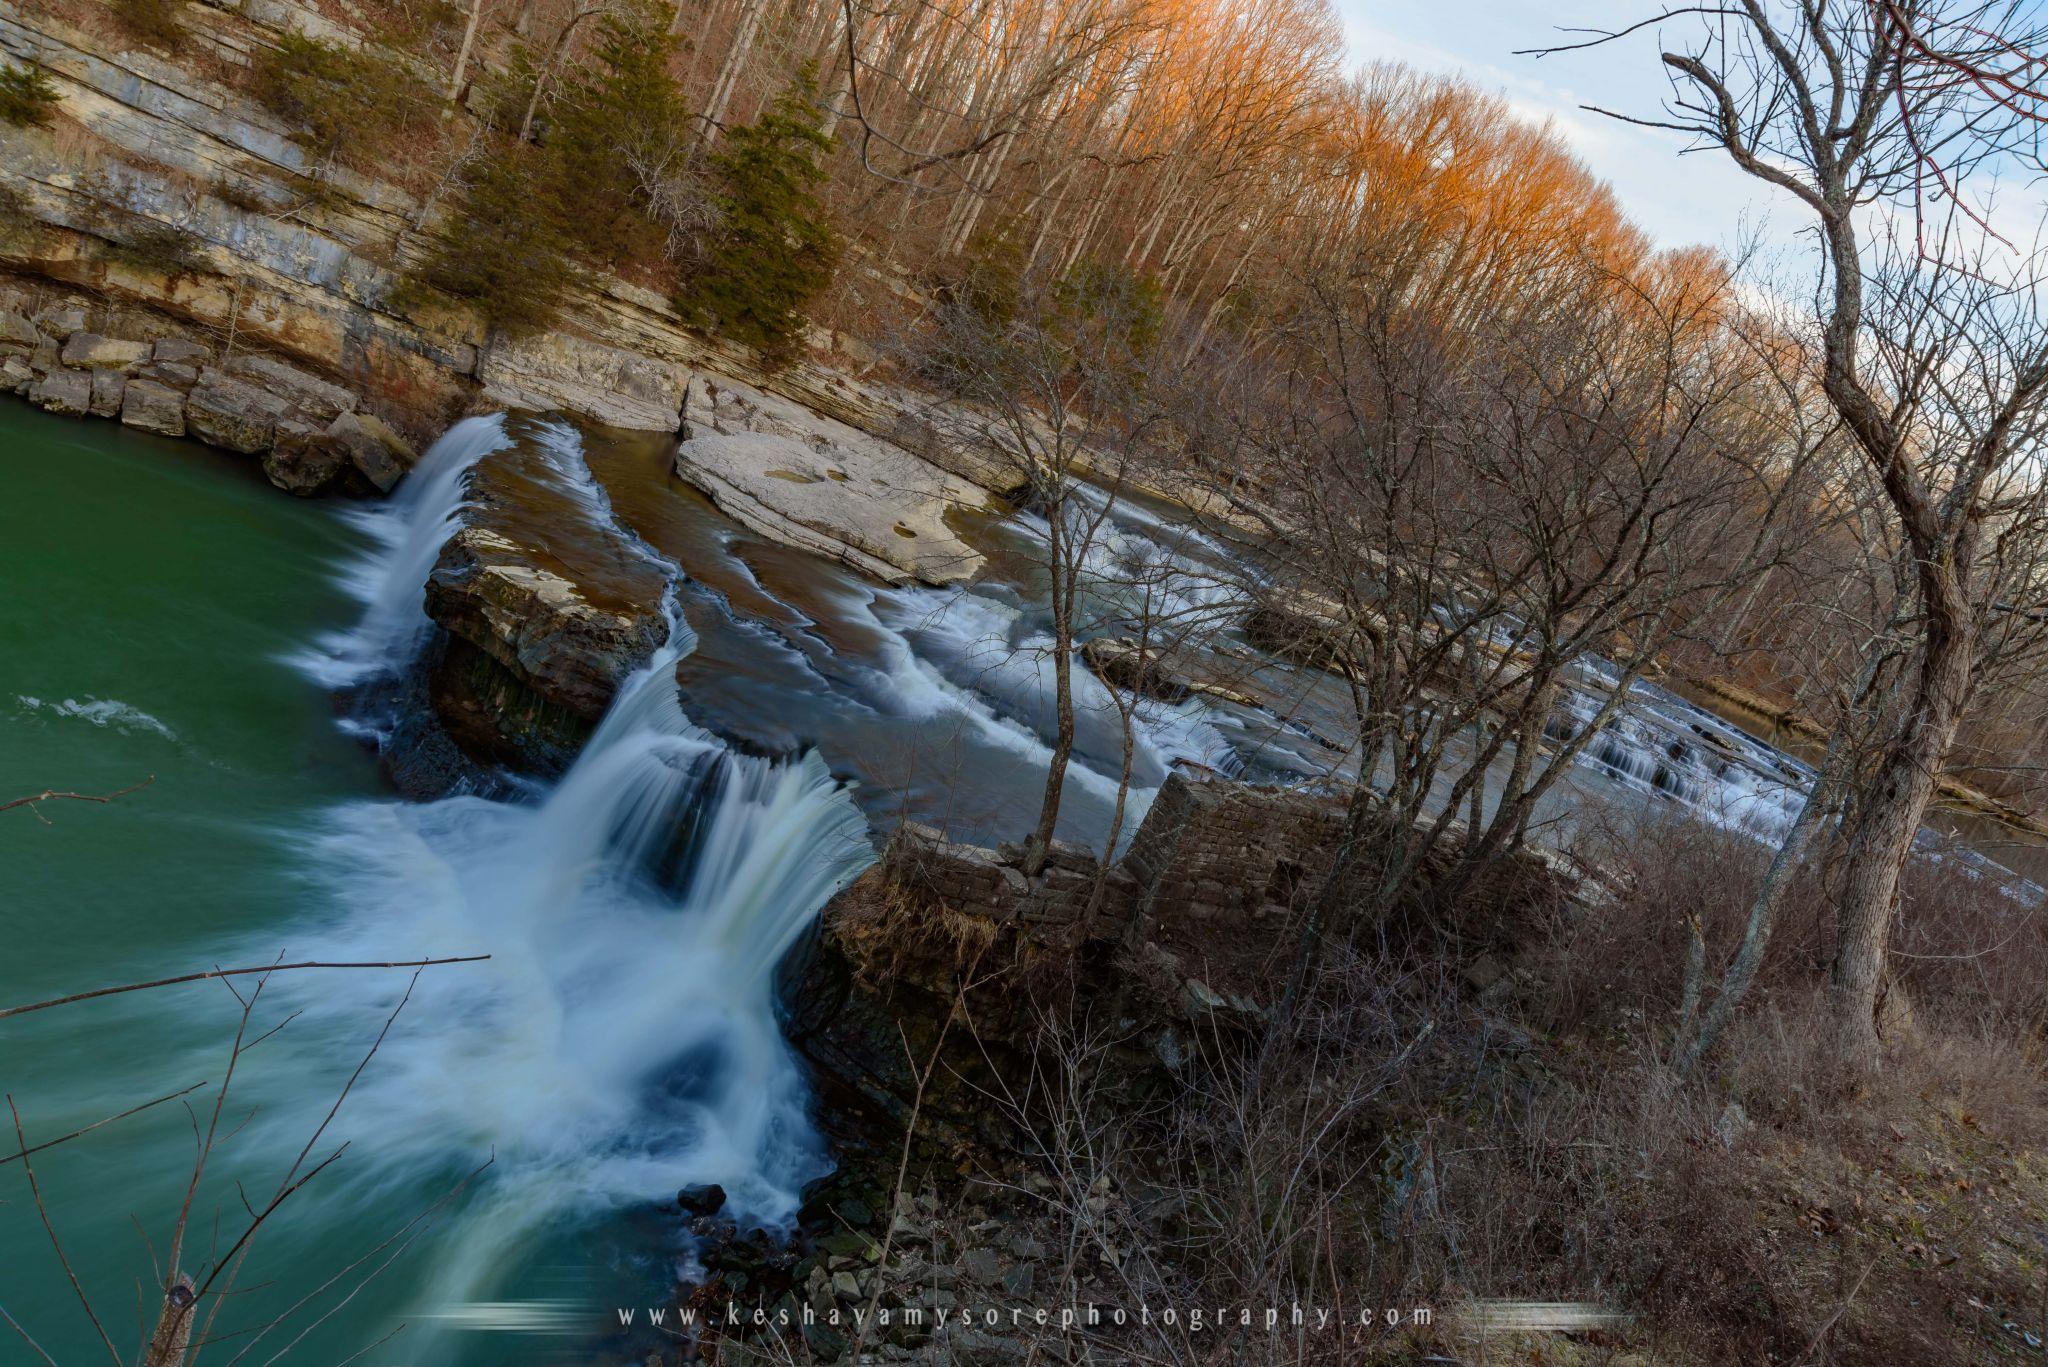 Upper Cataract Falls, USA